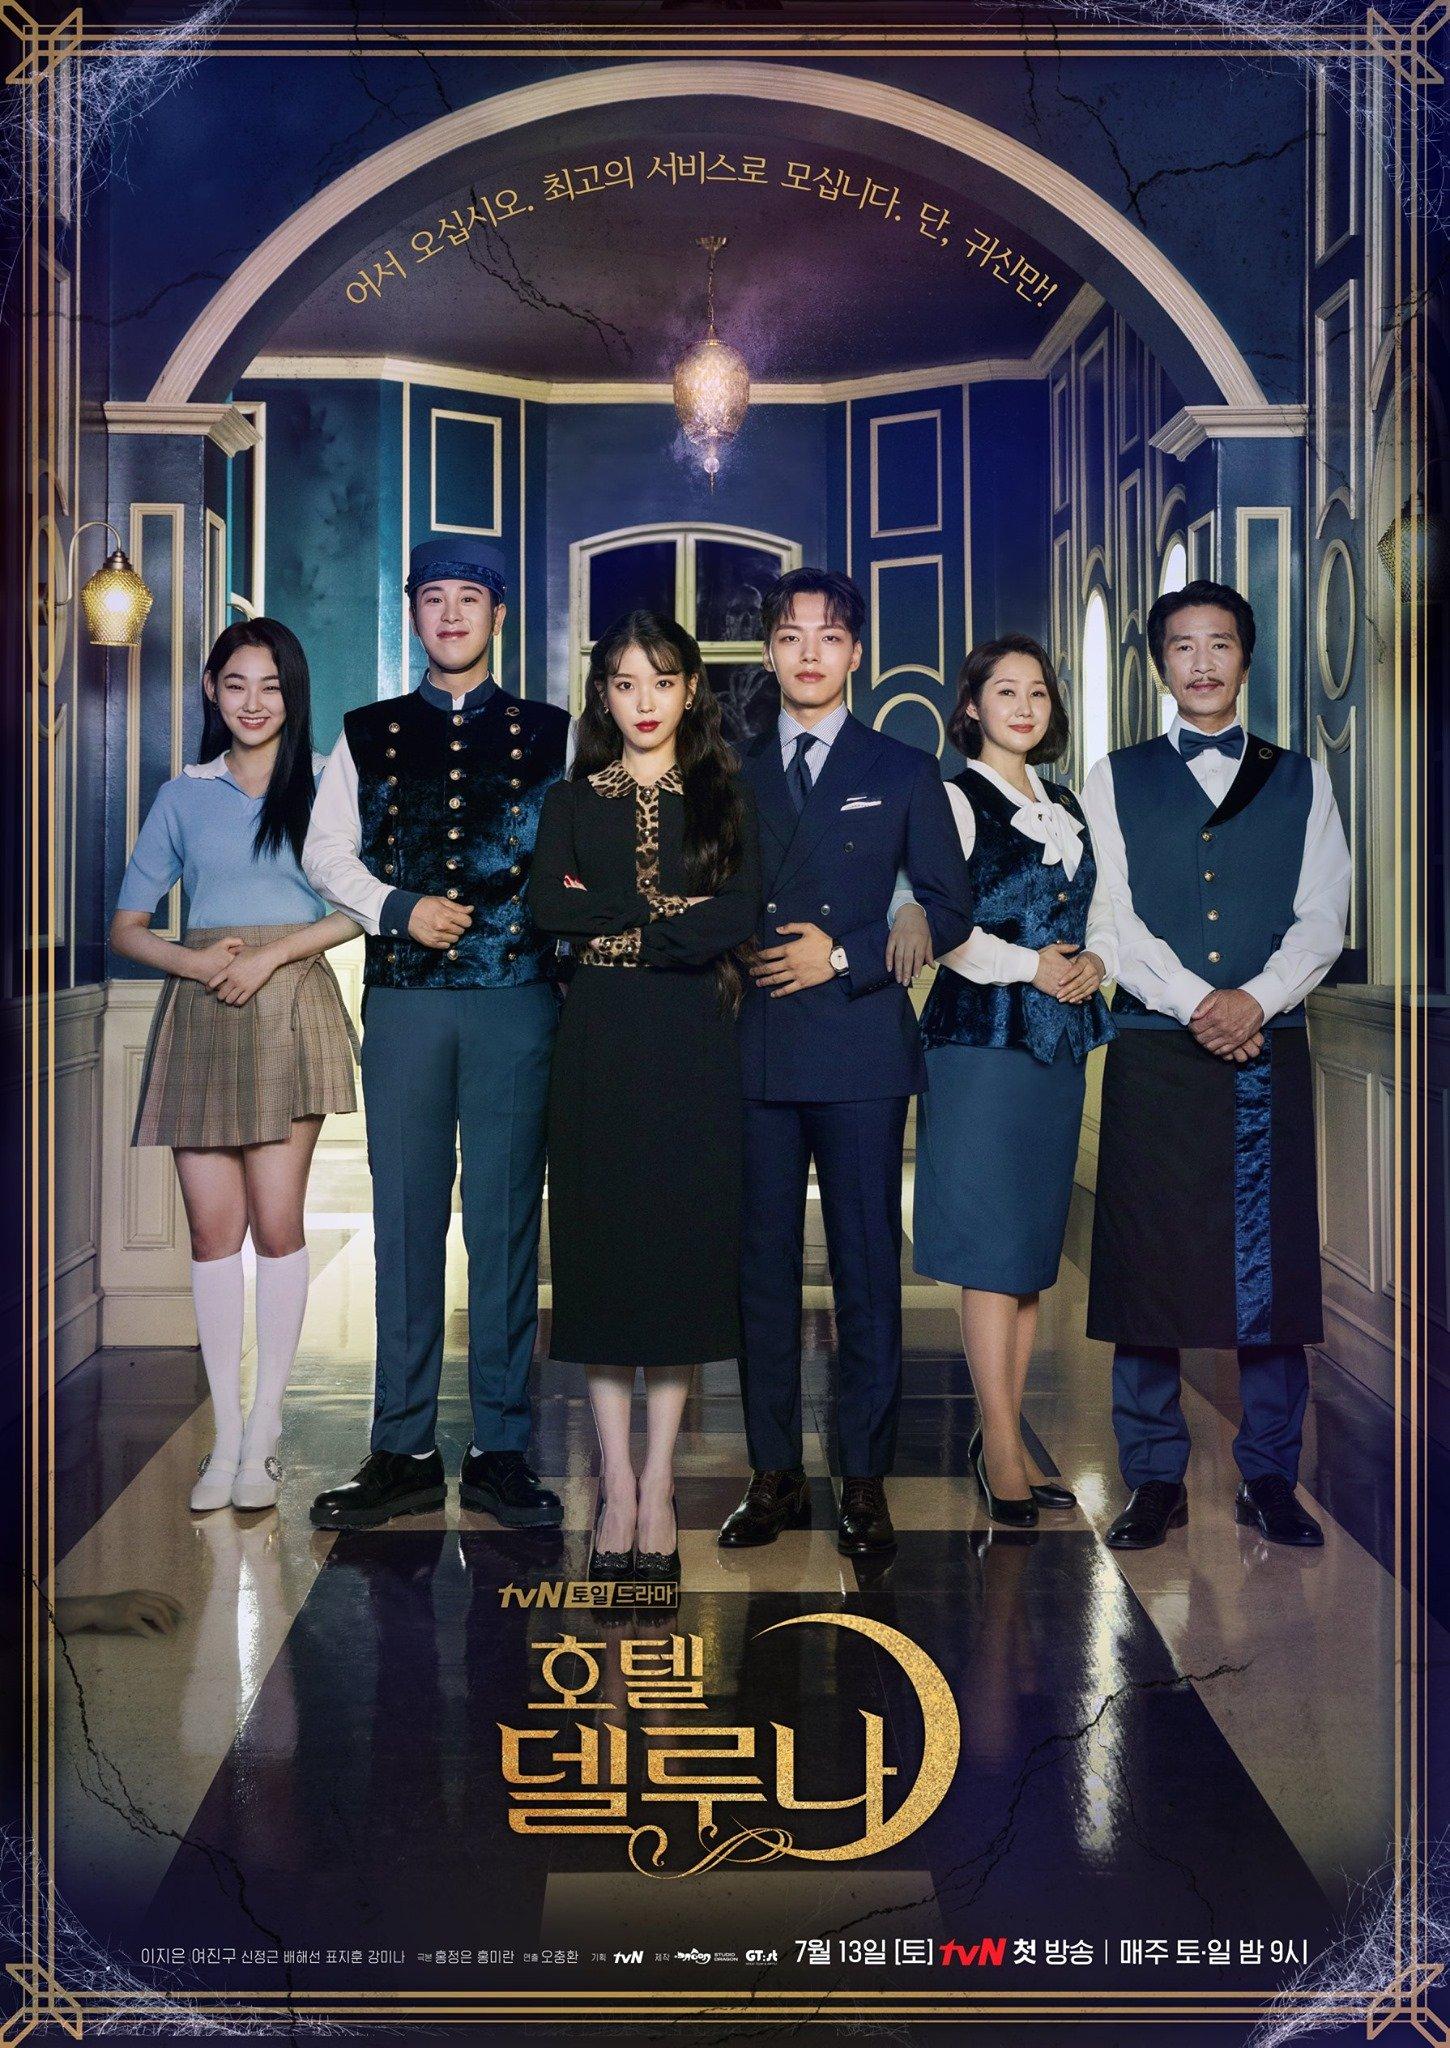 phim hàn kinh phí cao hotel del luna